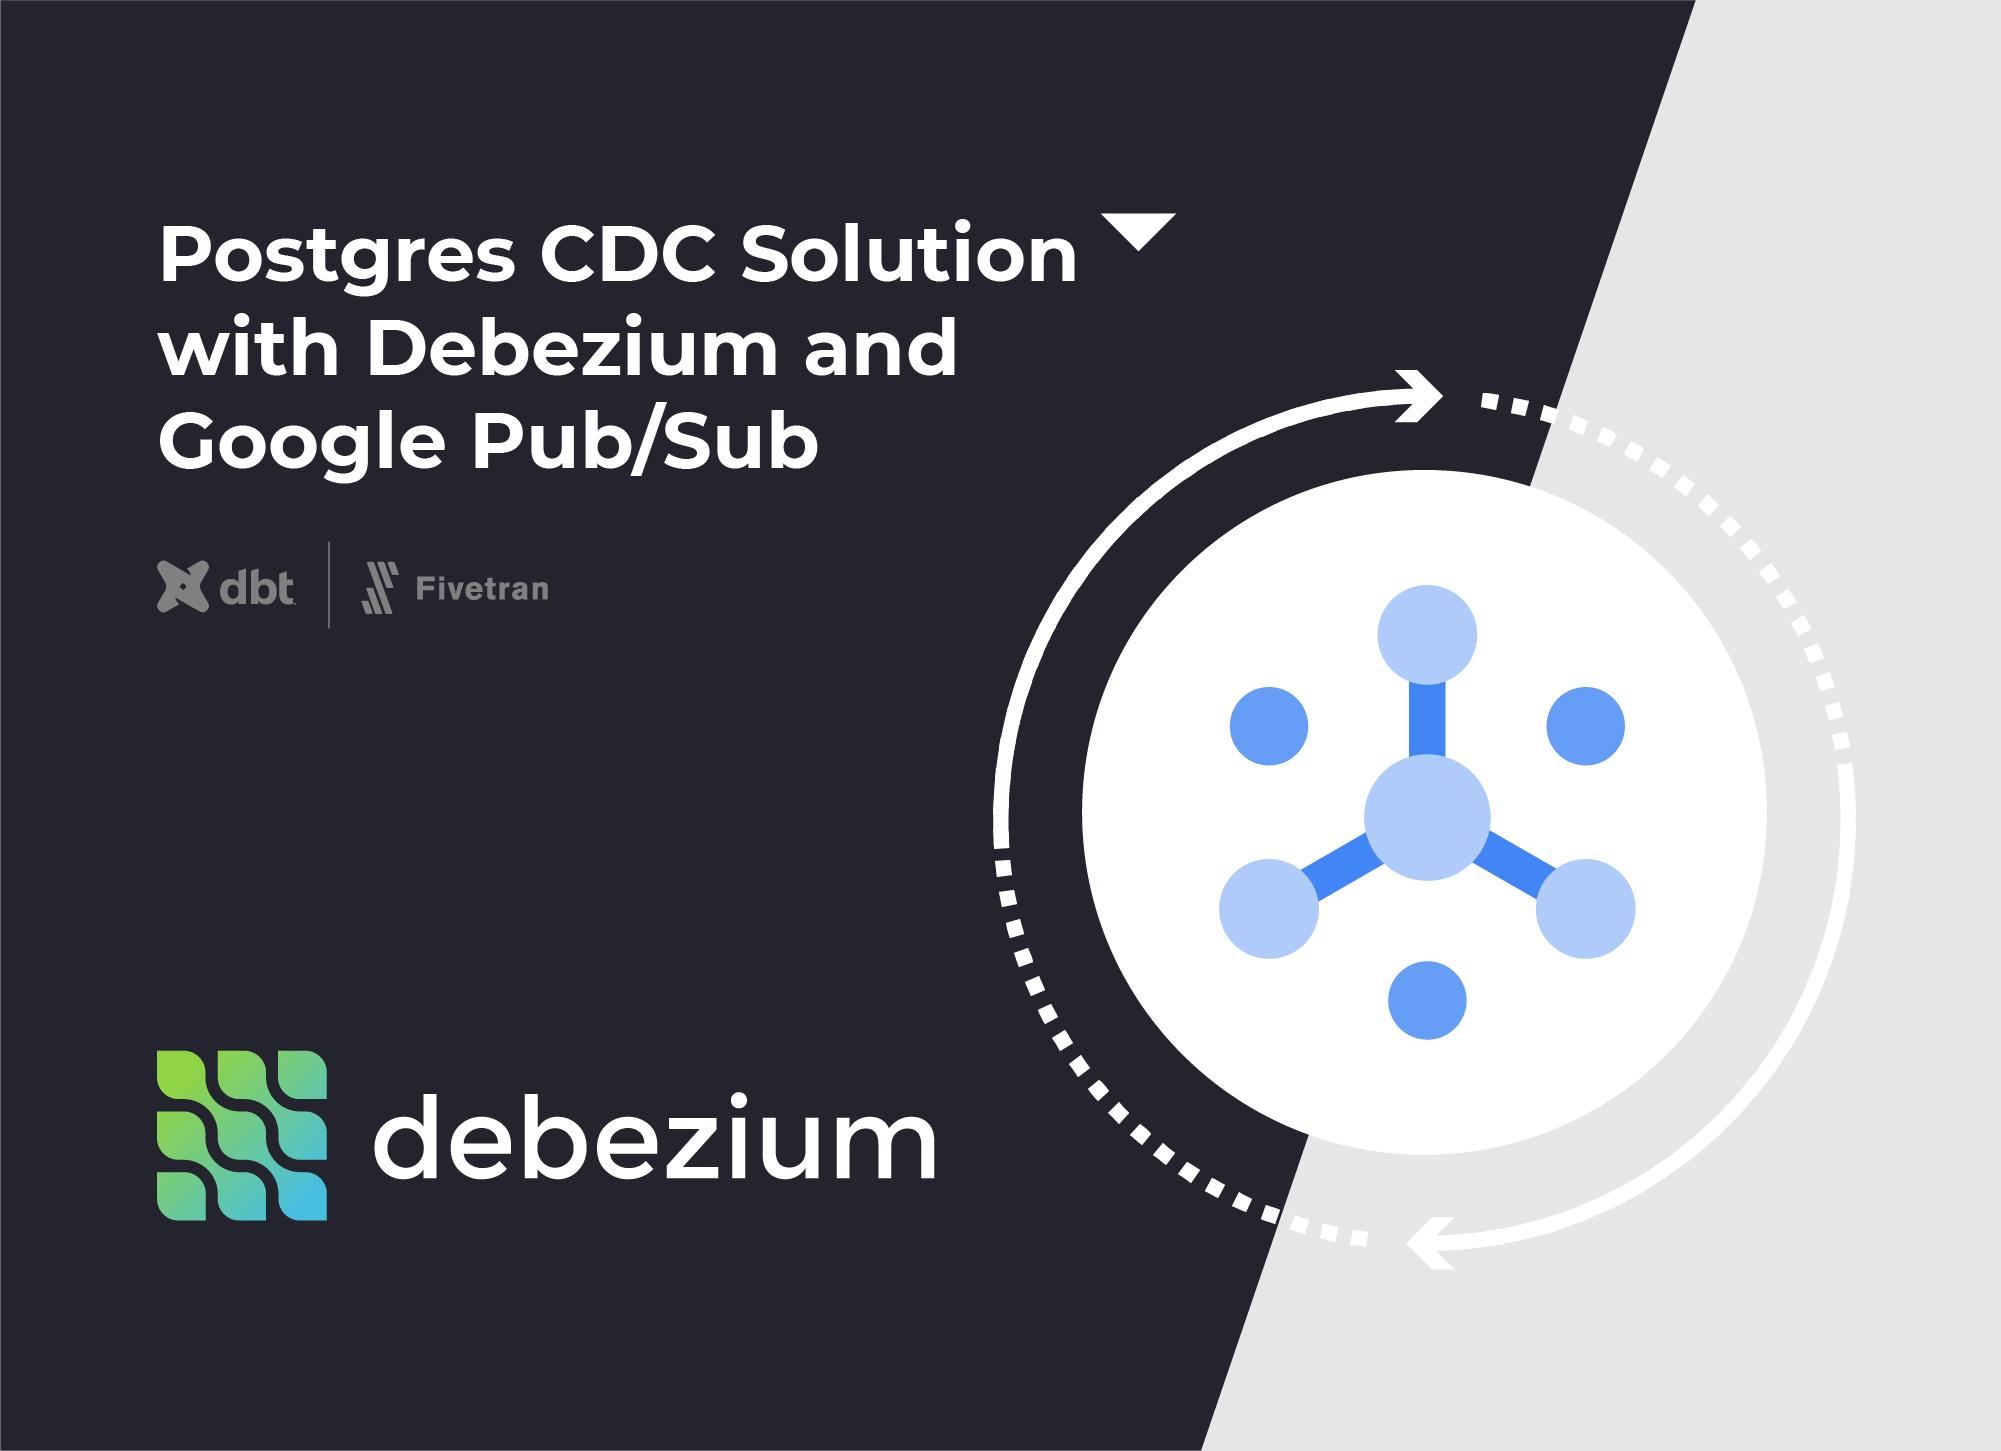 Postgres CDC Solution with Debezium and Google PubSub